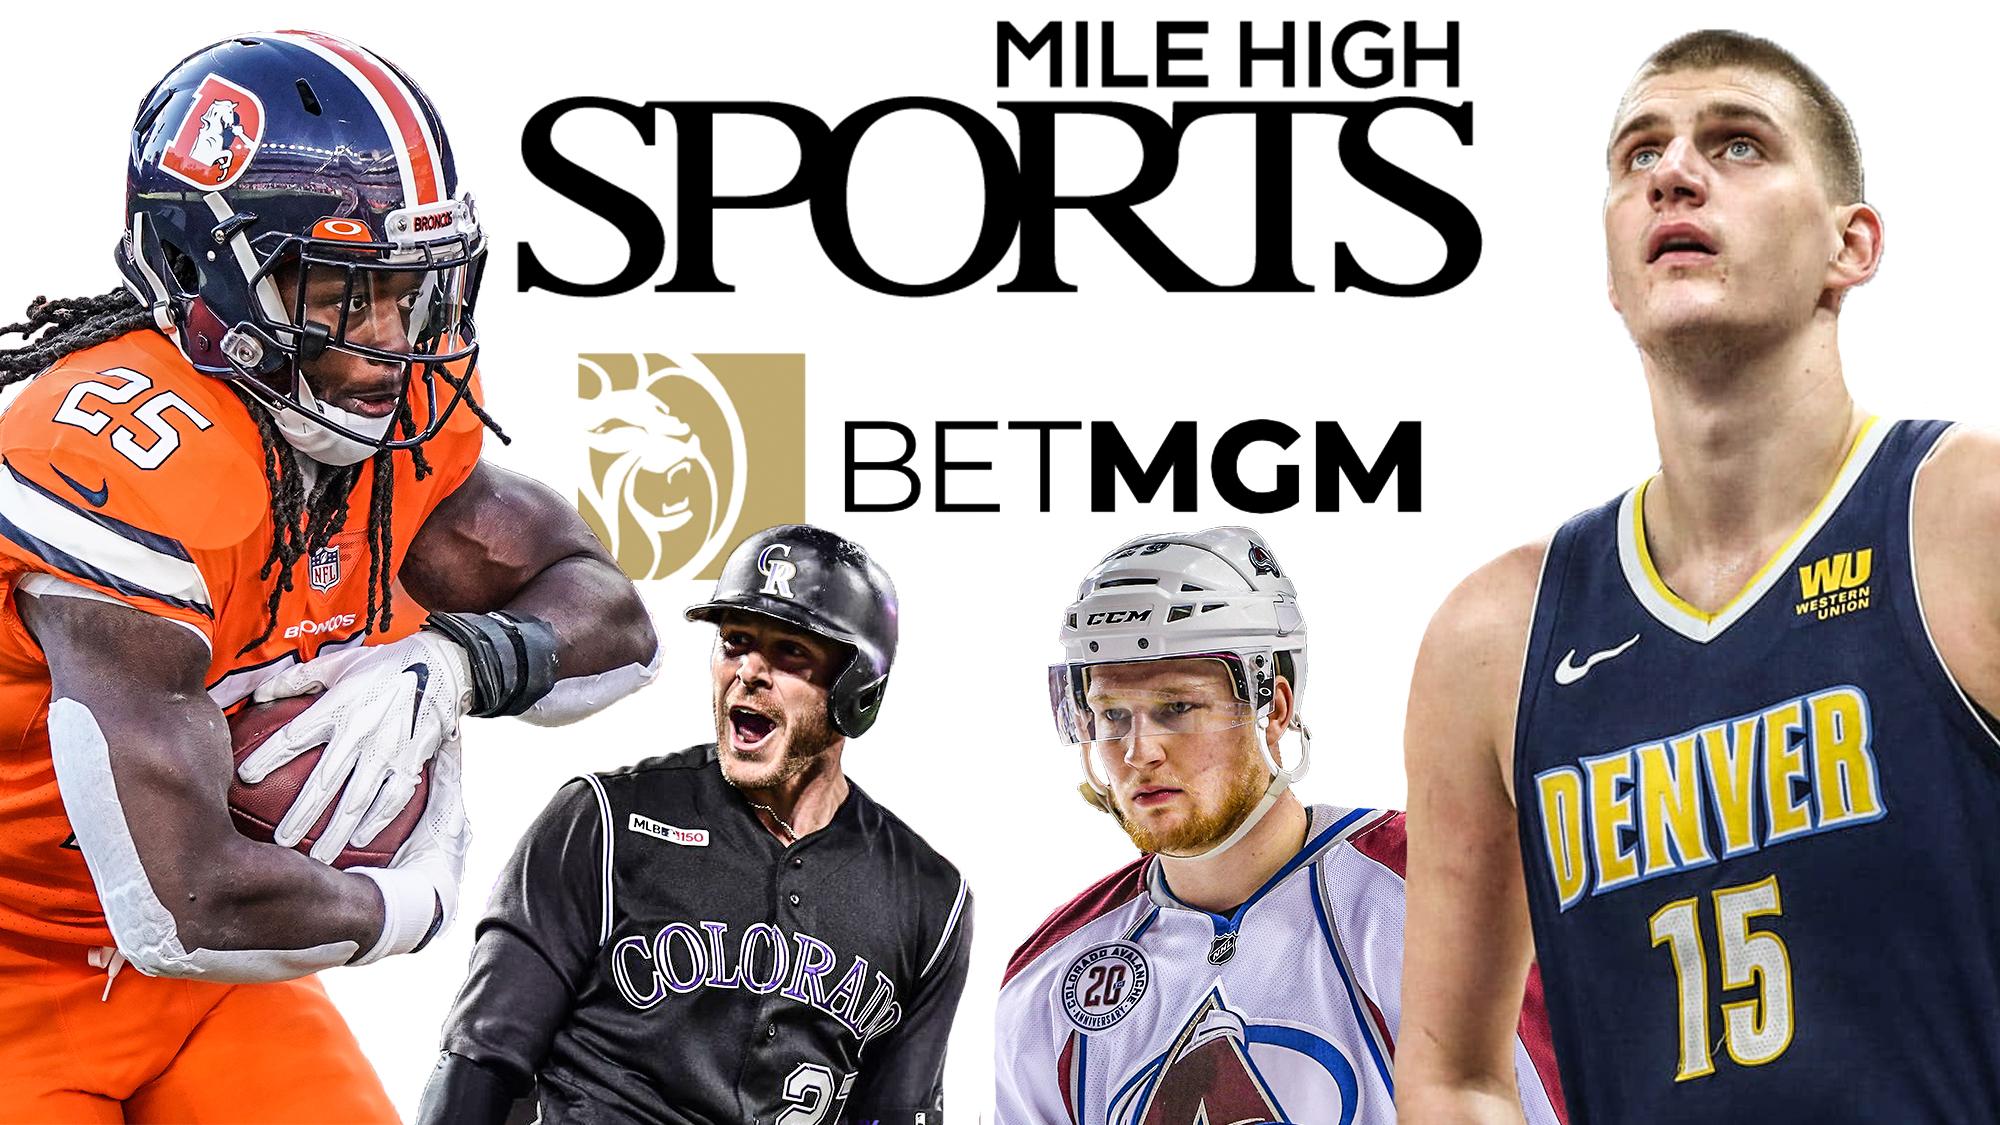 Mile High Sports, BetMGM, Colorado Online Sports Betting, Melvin Gordon, Trevor Story, Nathan MacKinnon, Nikola Jokic